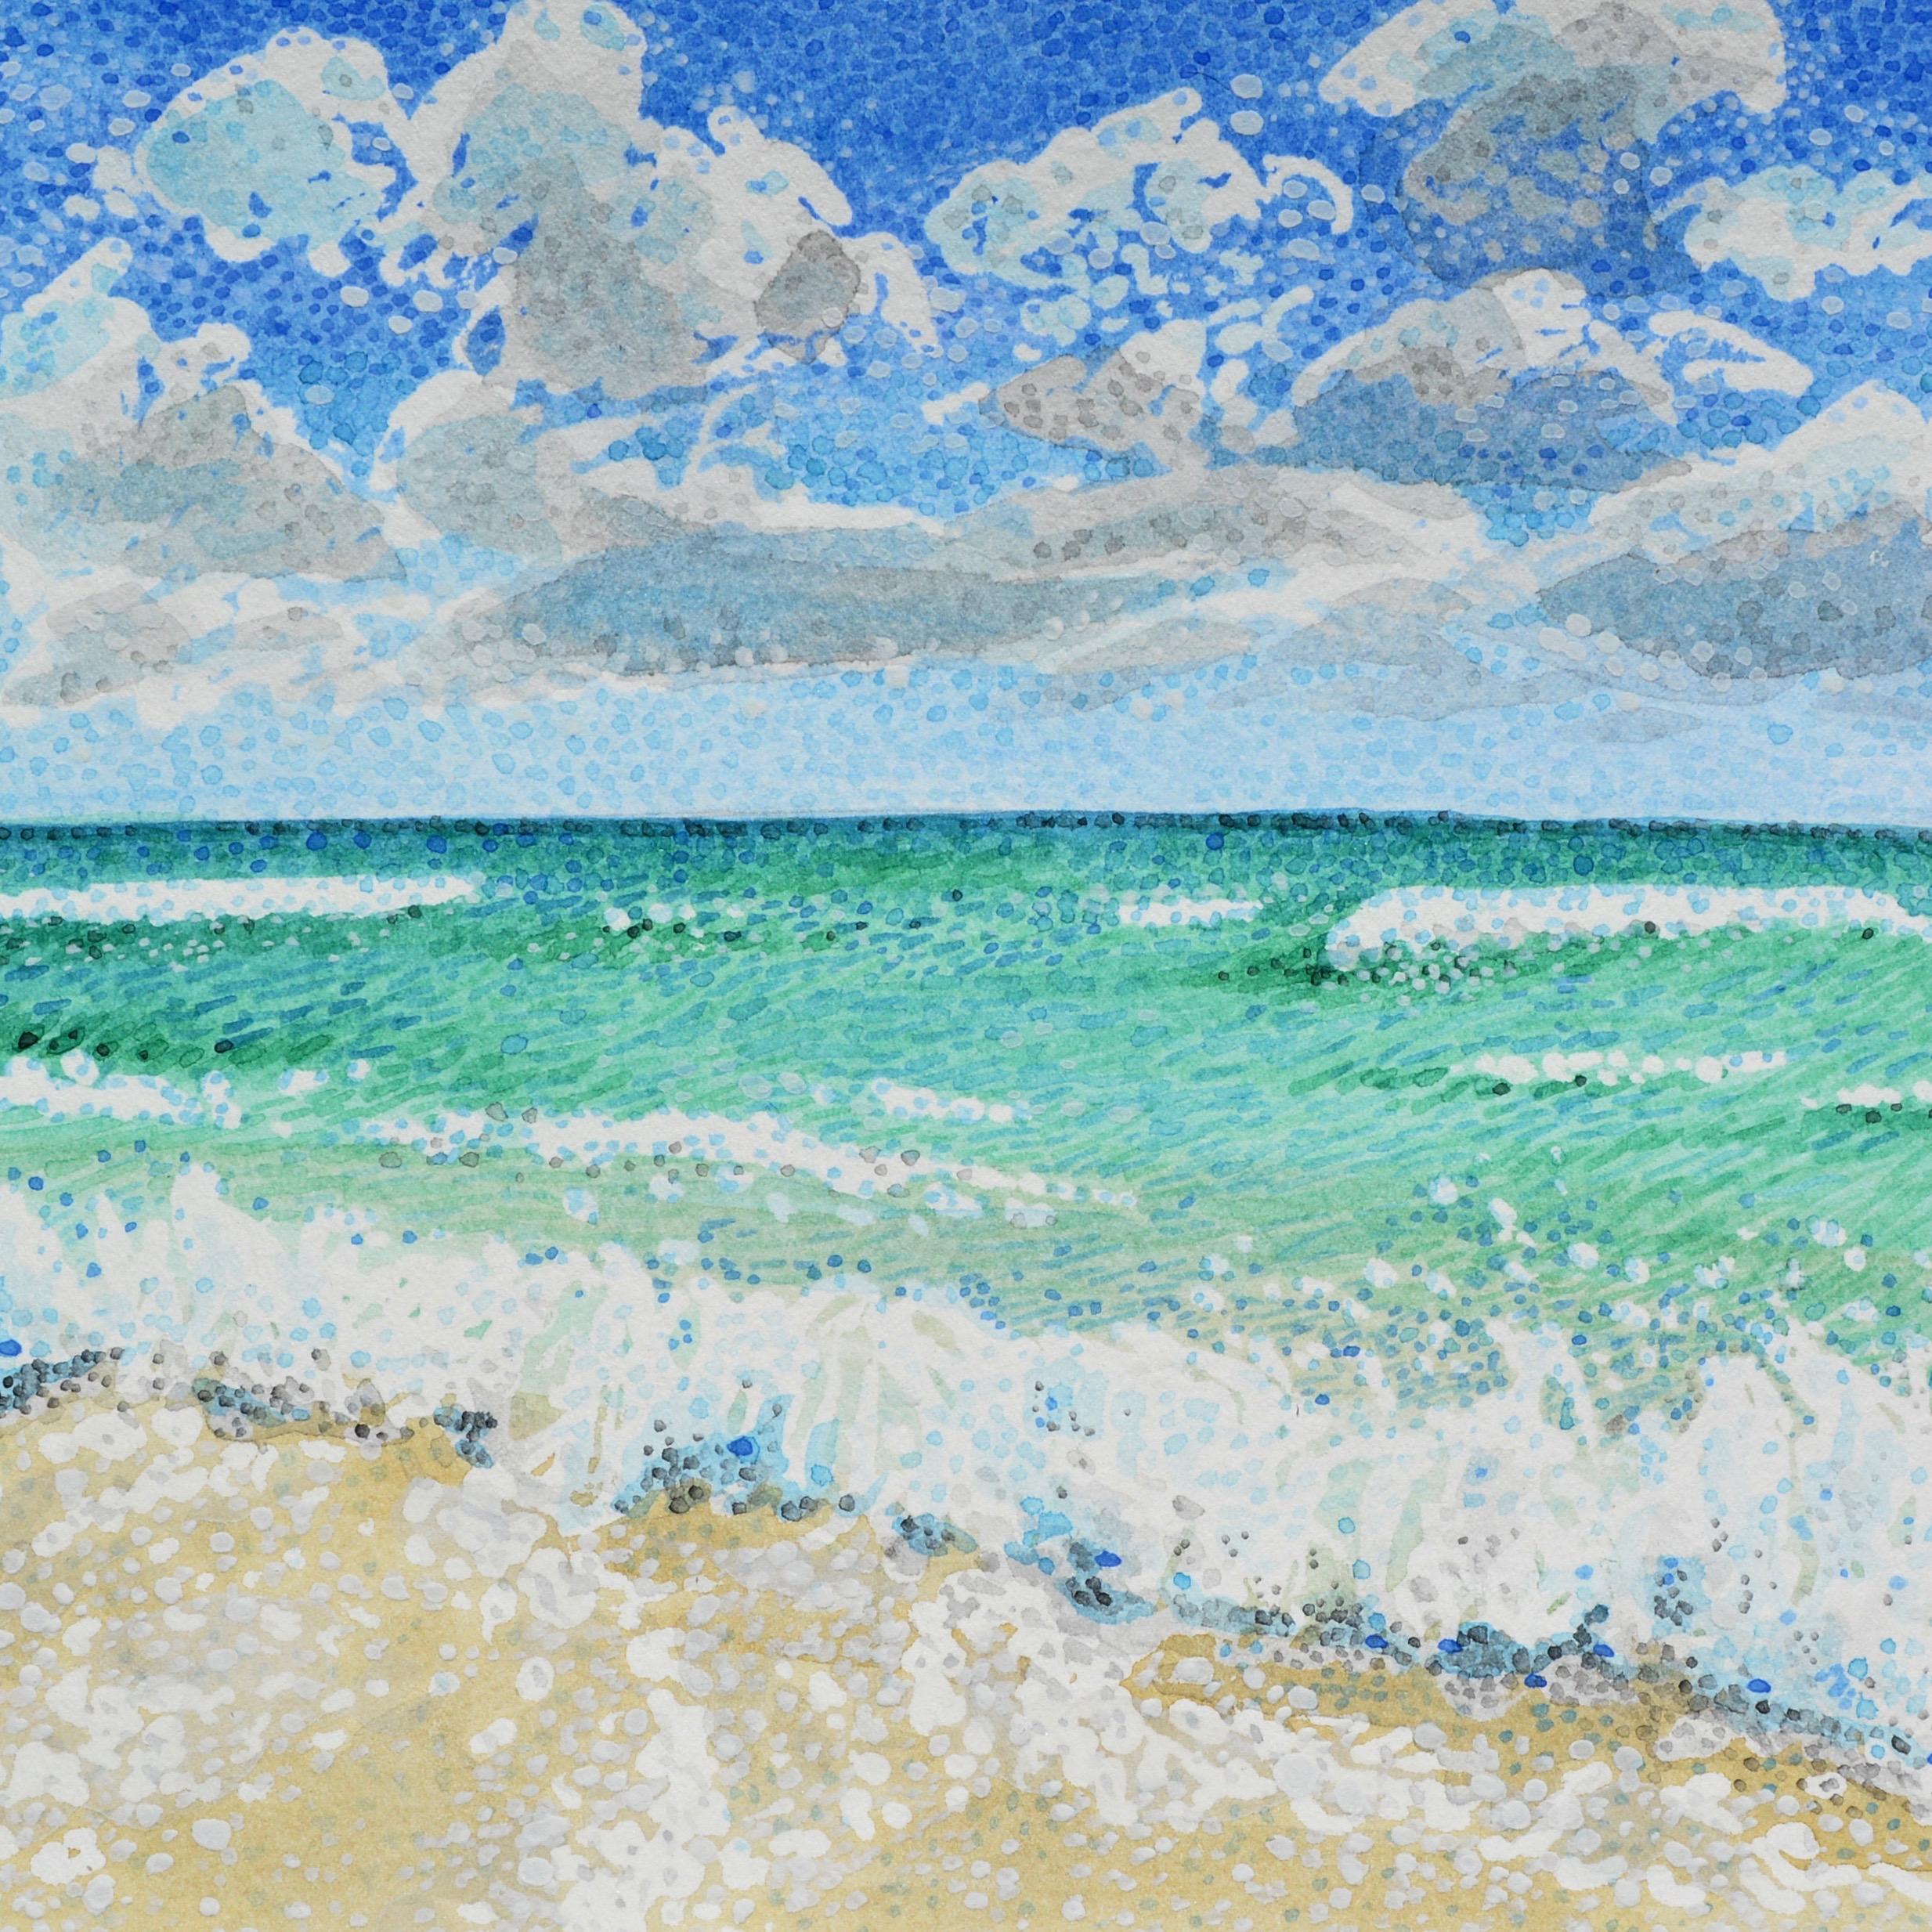 Gulf Islands National Seashore, Florida: 3/27/17, 11:30:14